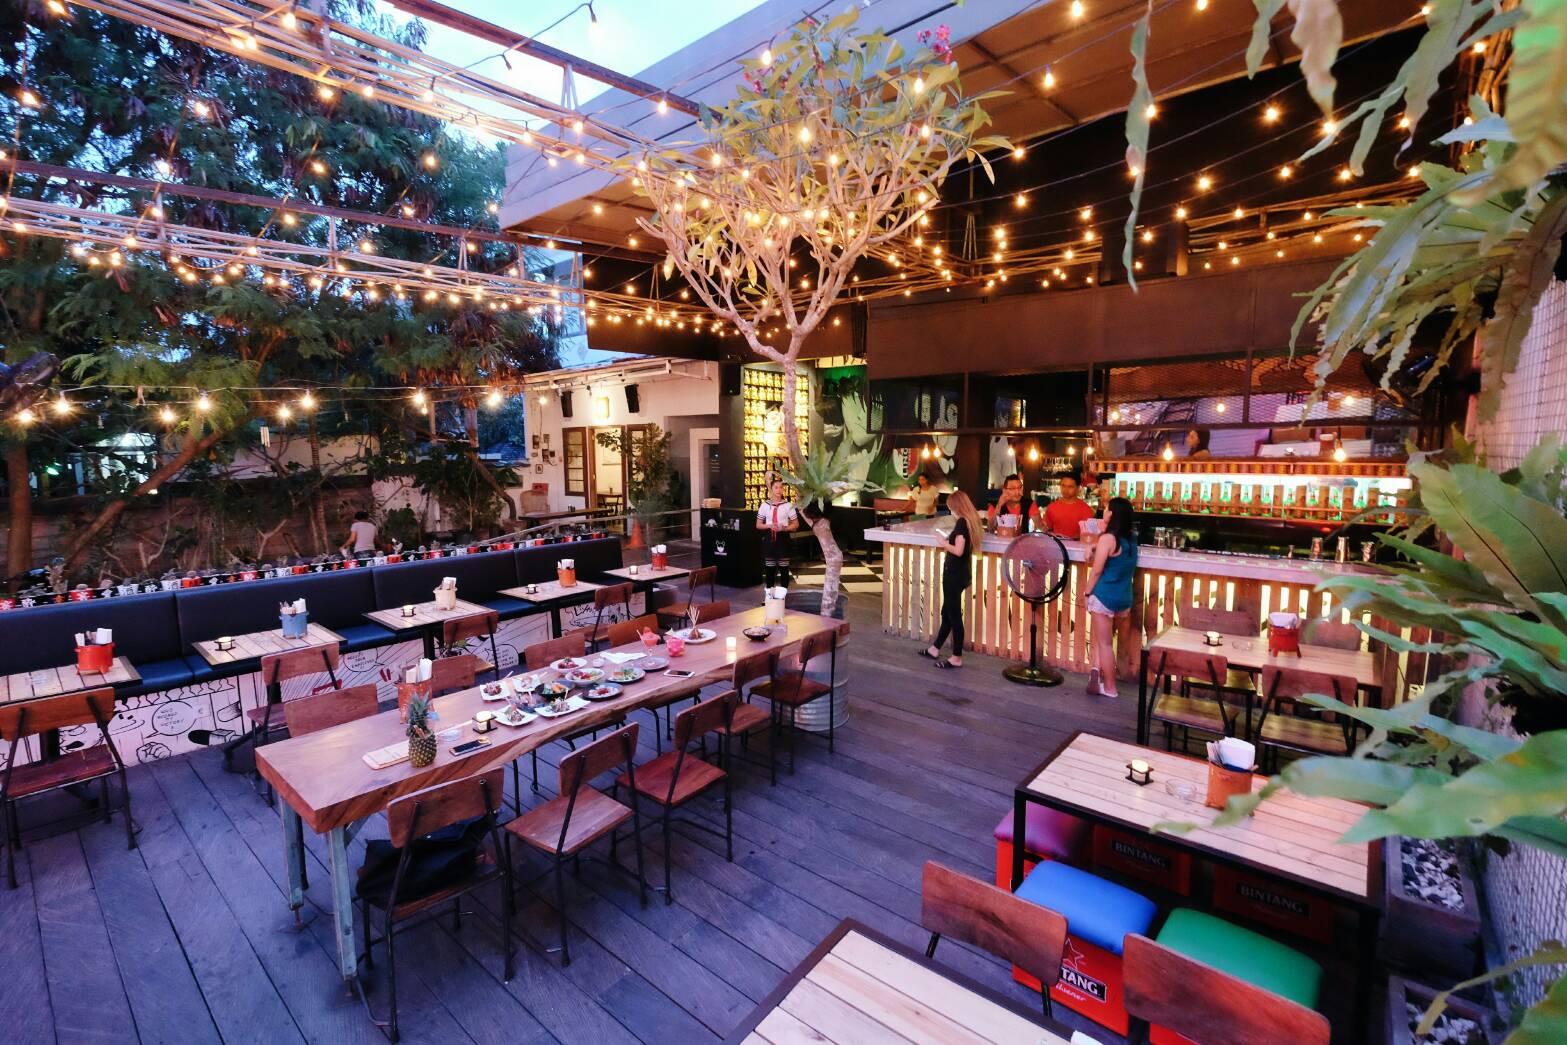 Ling-Ling's Restaurant